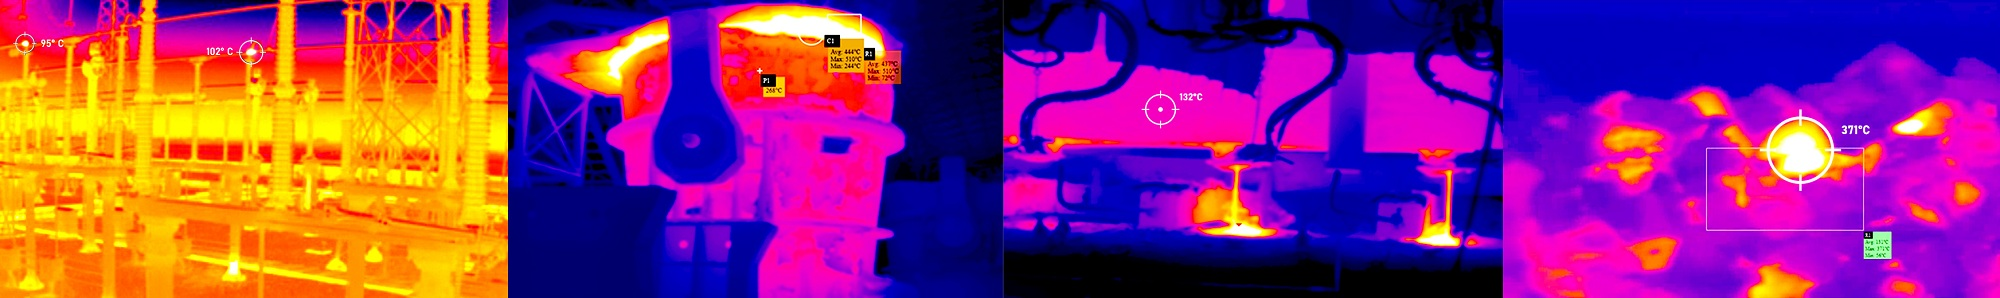 Thermal Camera Footage